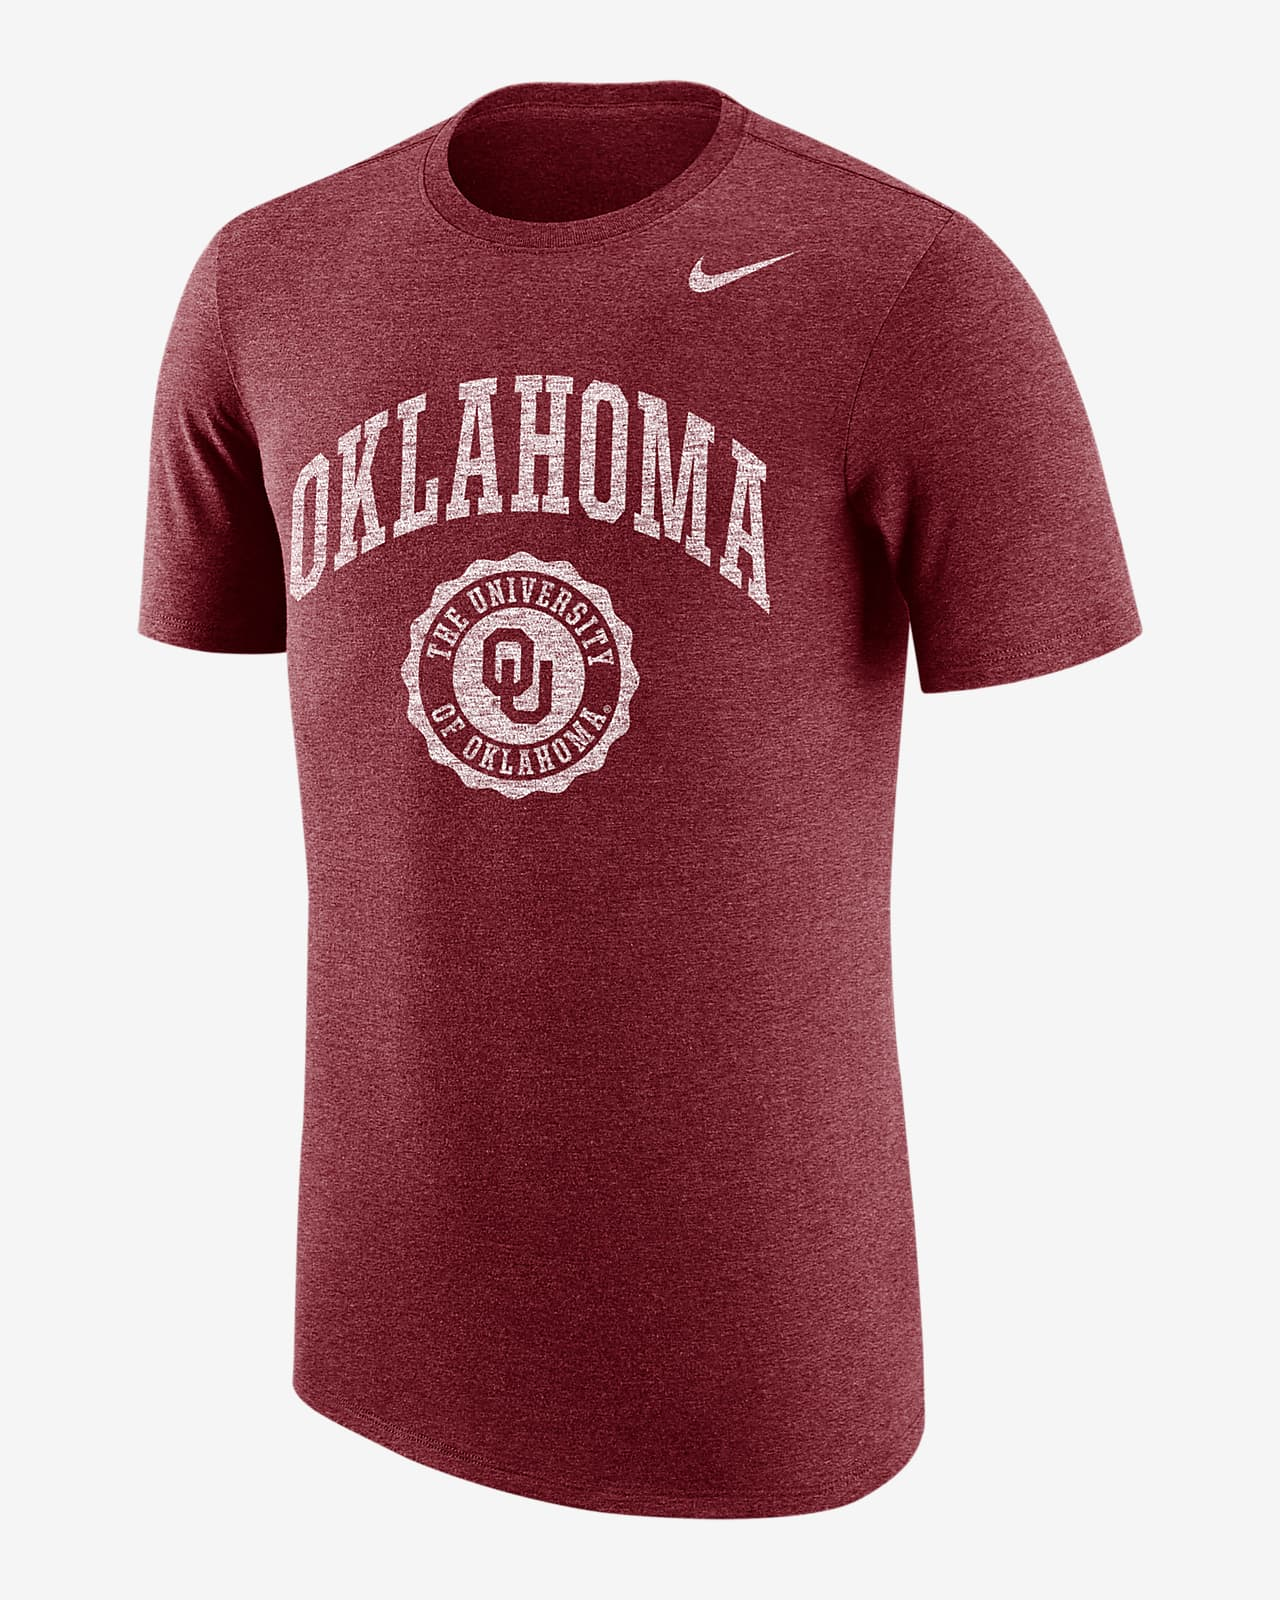 Nike College (Oklahoma) Men's T-Shirt